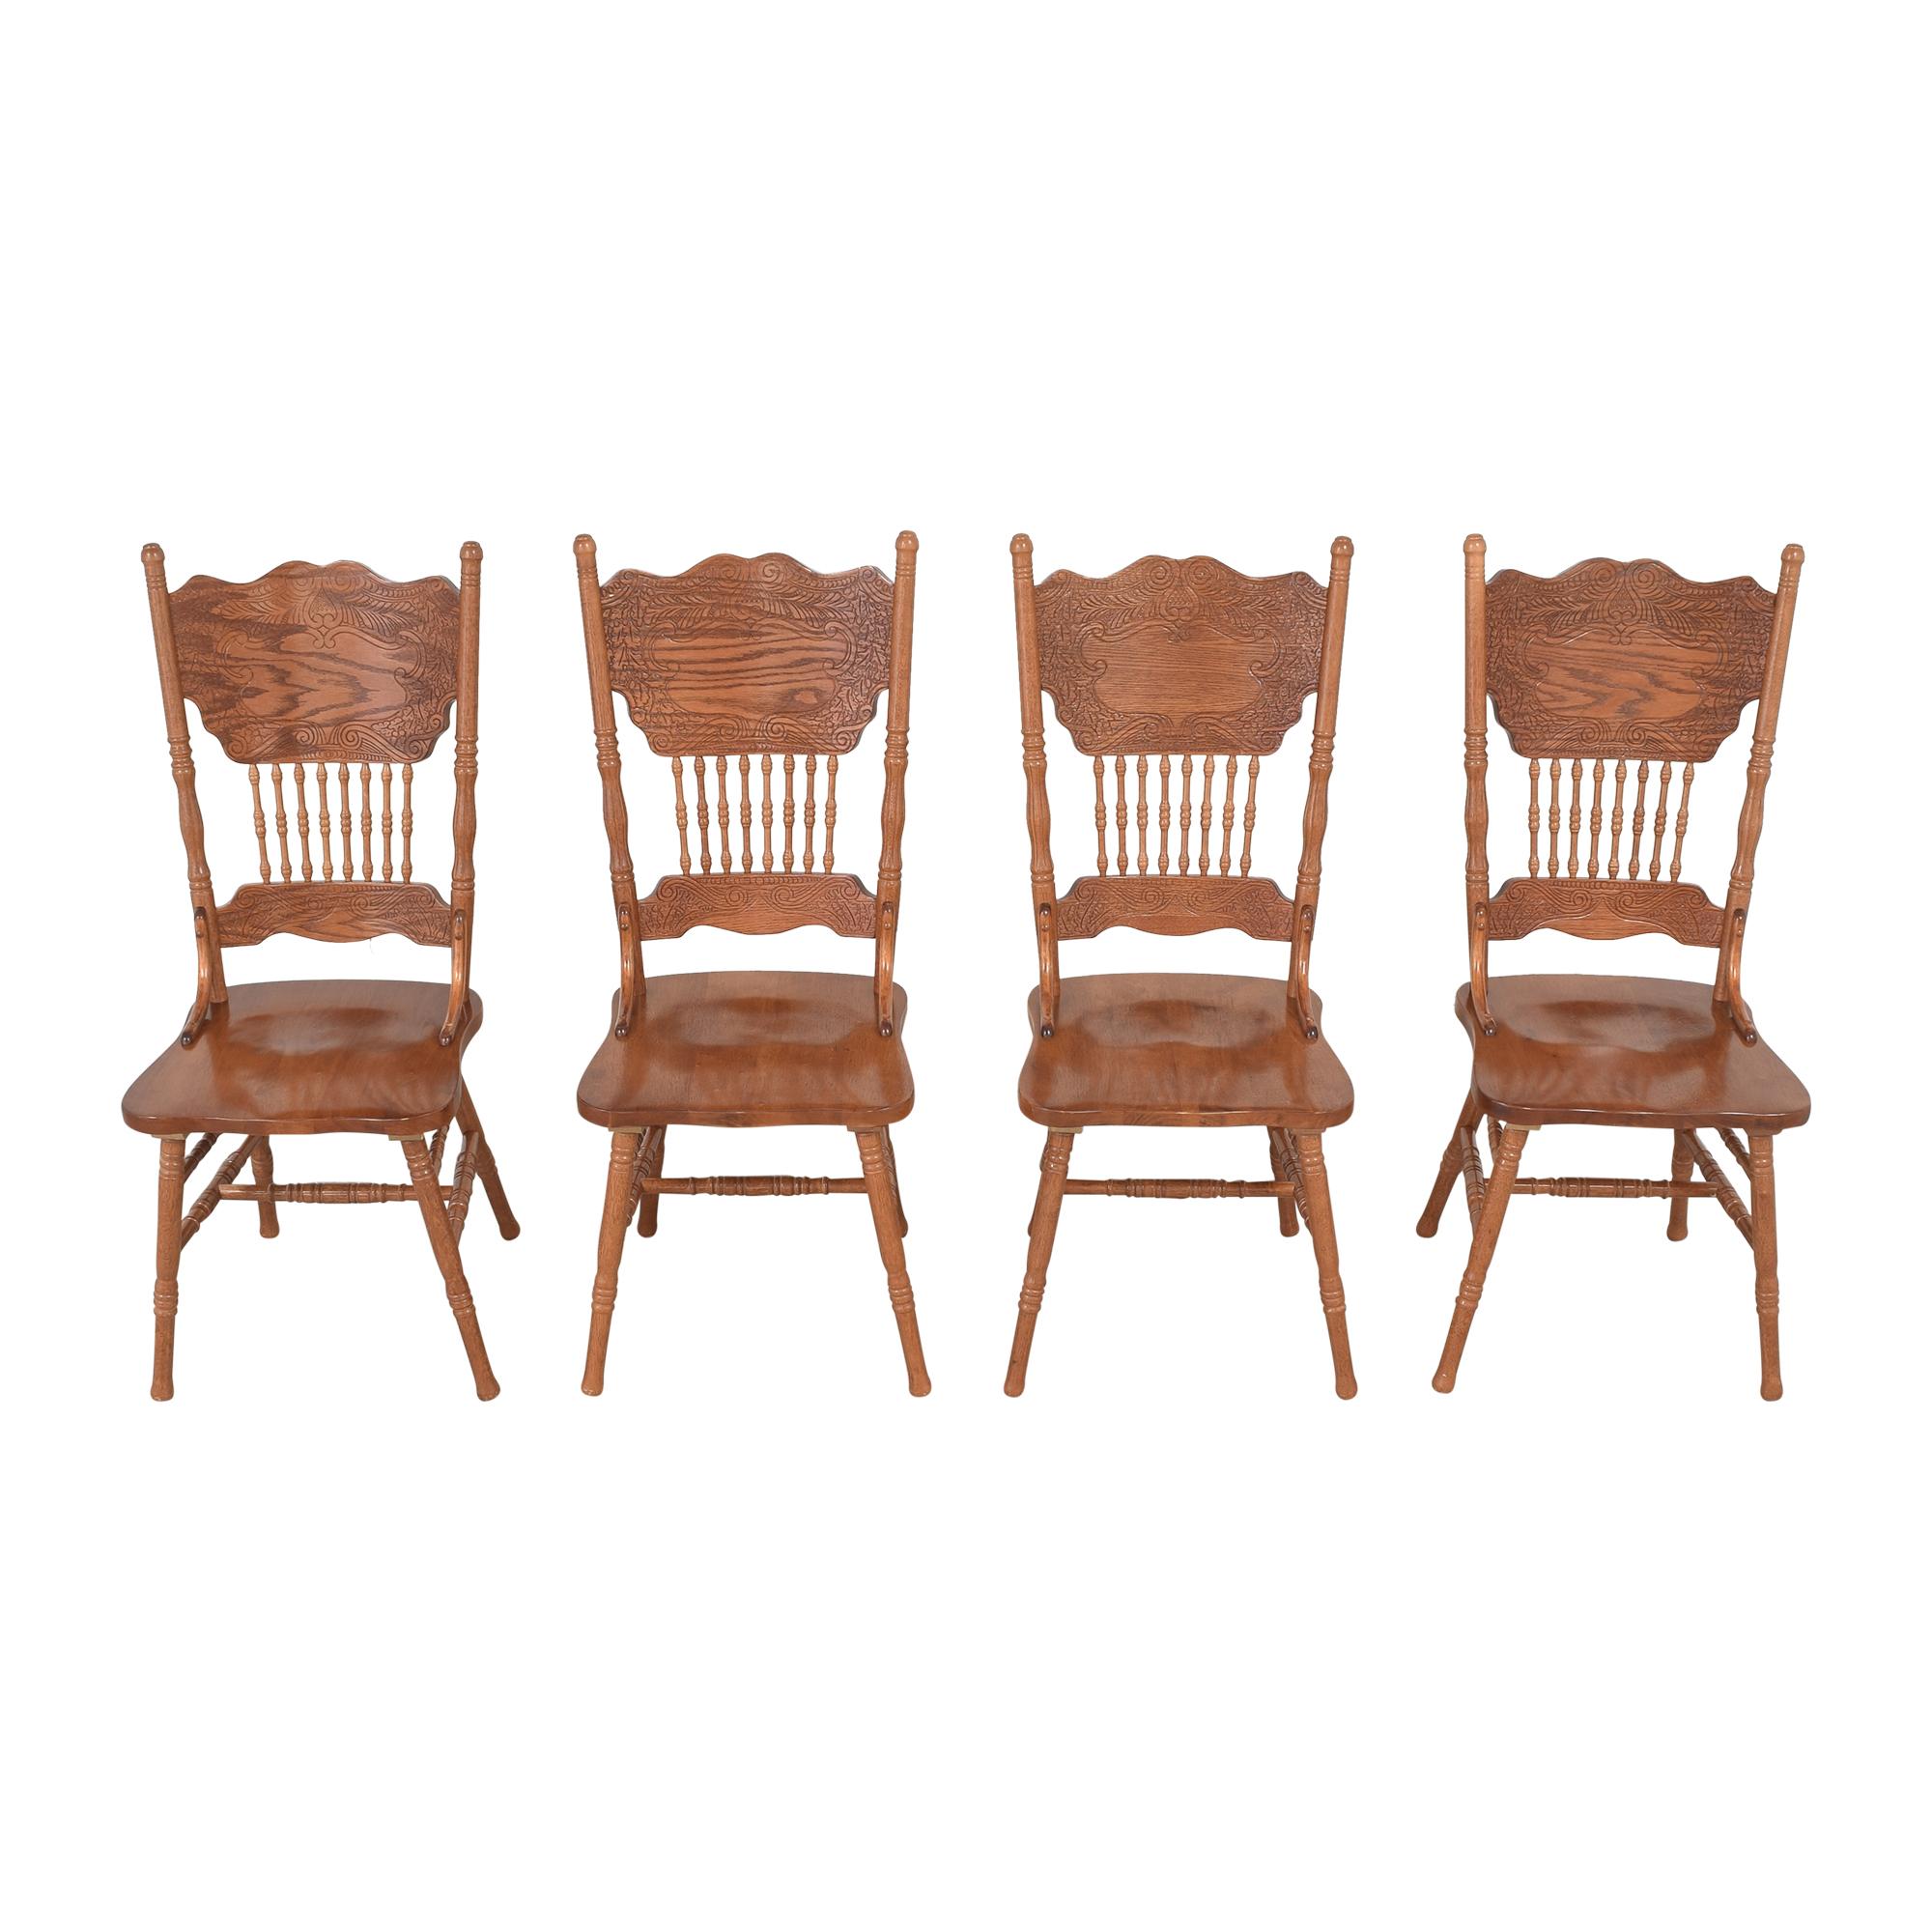 Poundex Poundex Pressback Dining Chairs nj